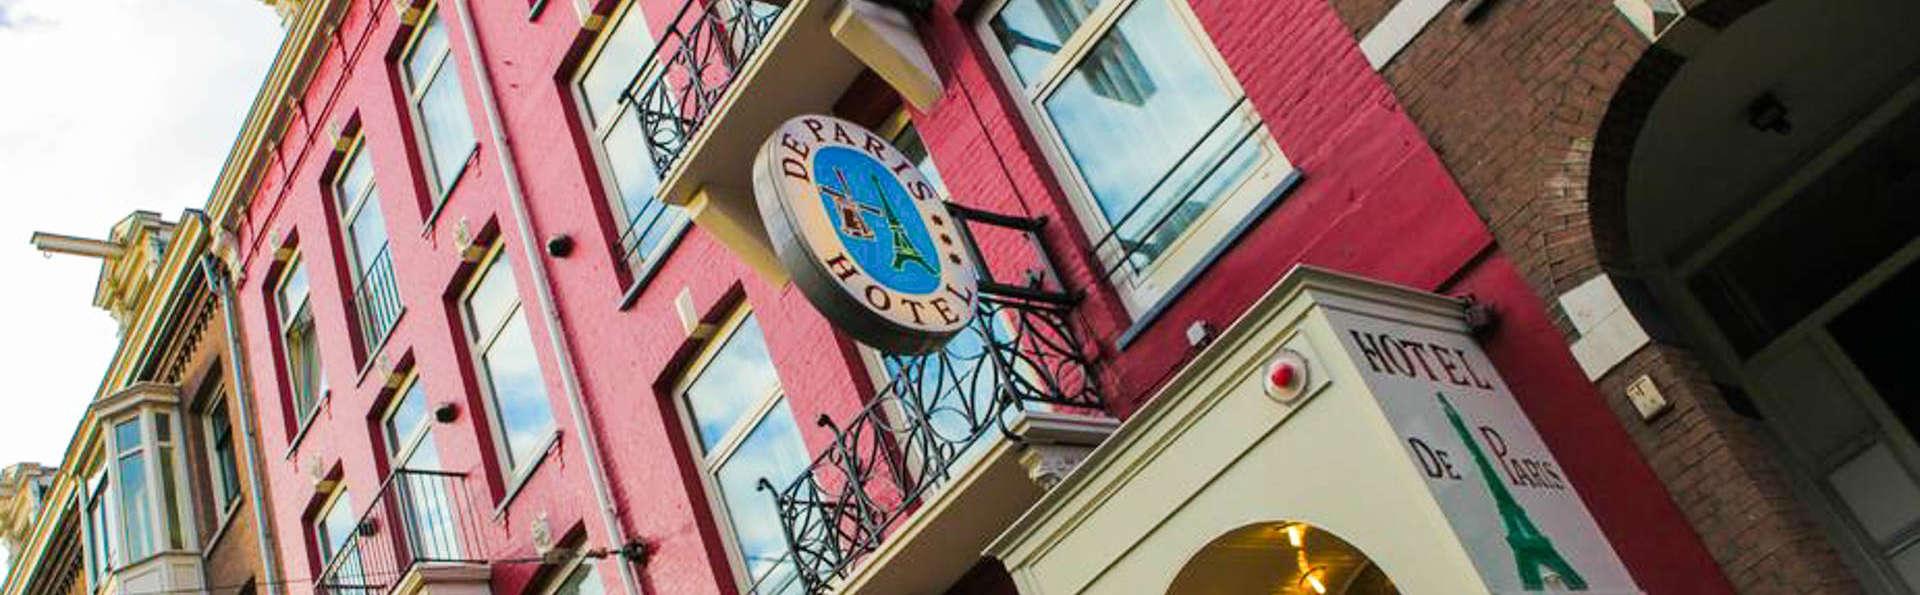 Hotel de Paris Amsterdam - EDIT_WEB_FRONT2.jpg